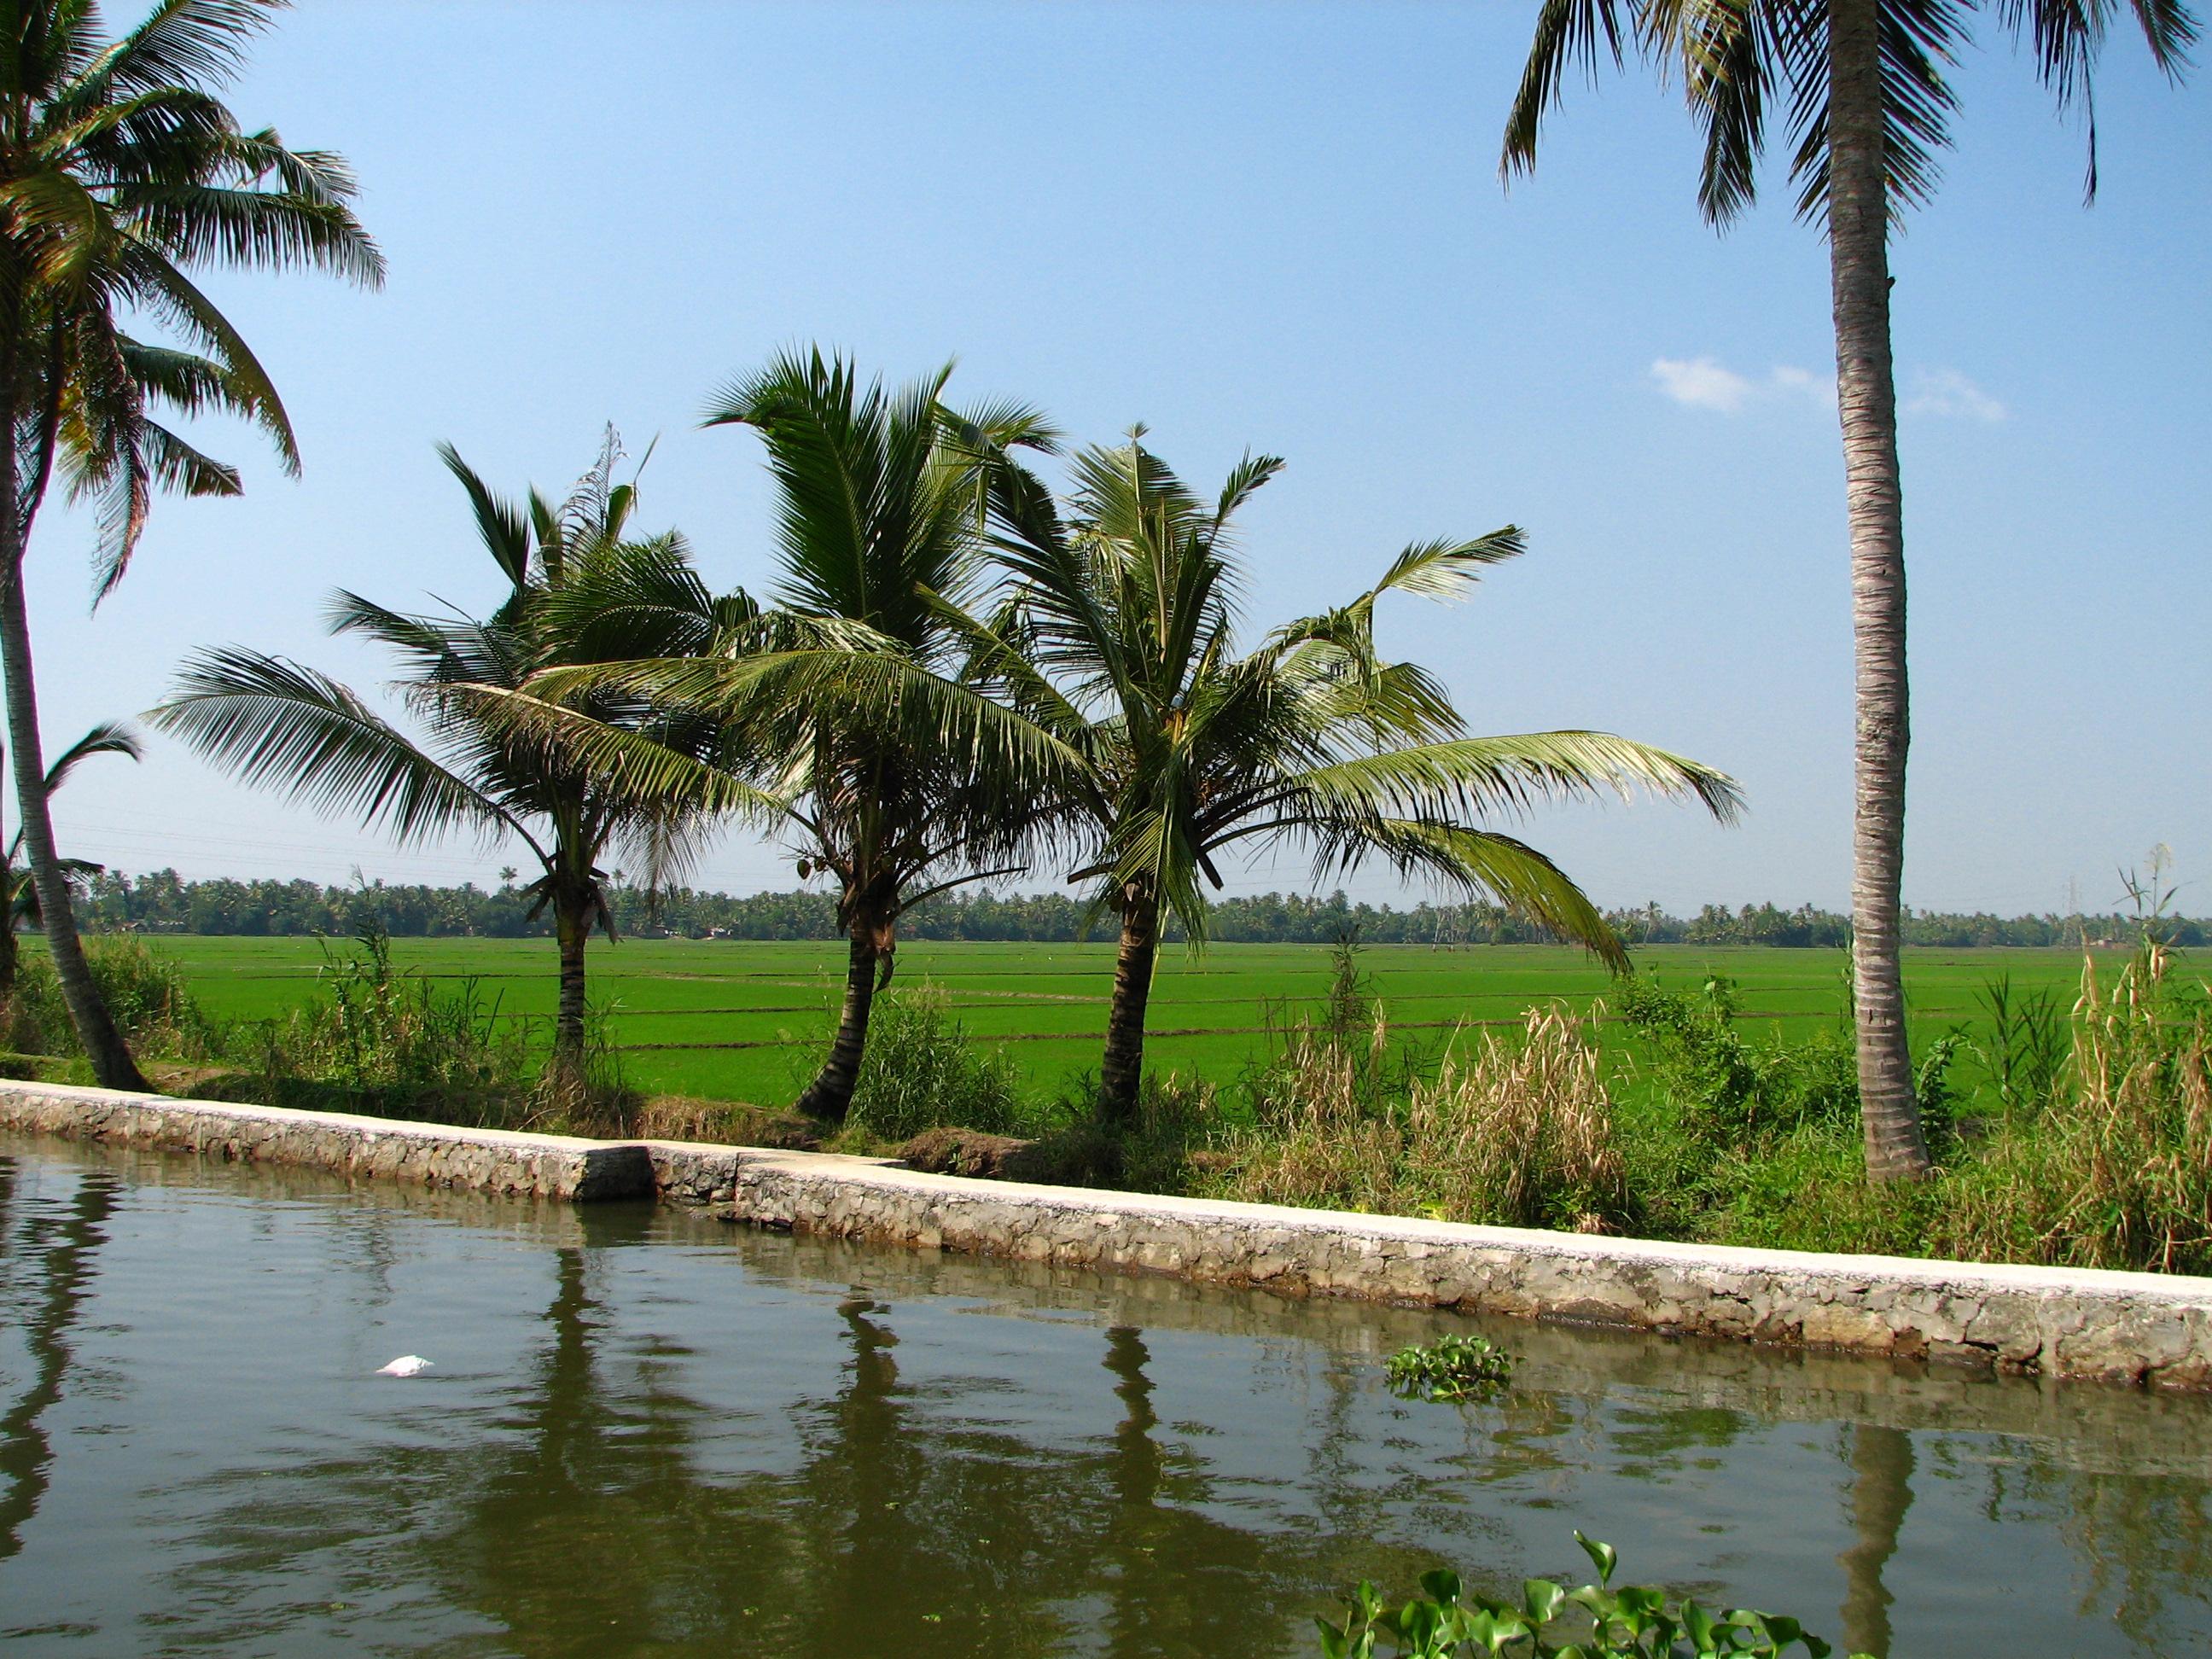 Description India - Kerala - 007 - paddy fields line the backwaters ...